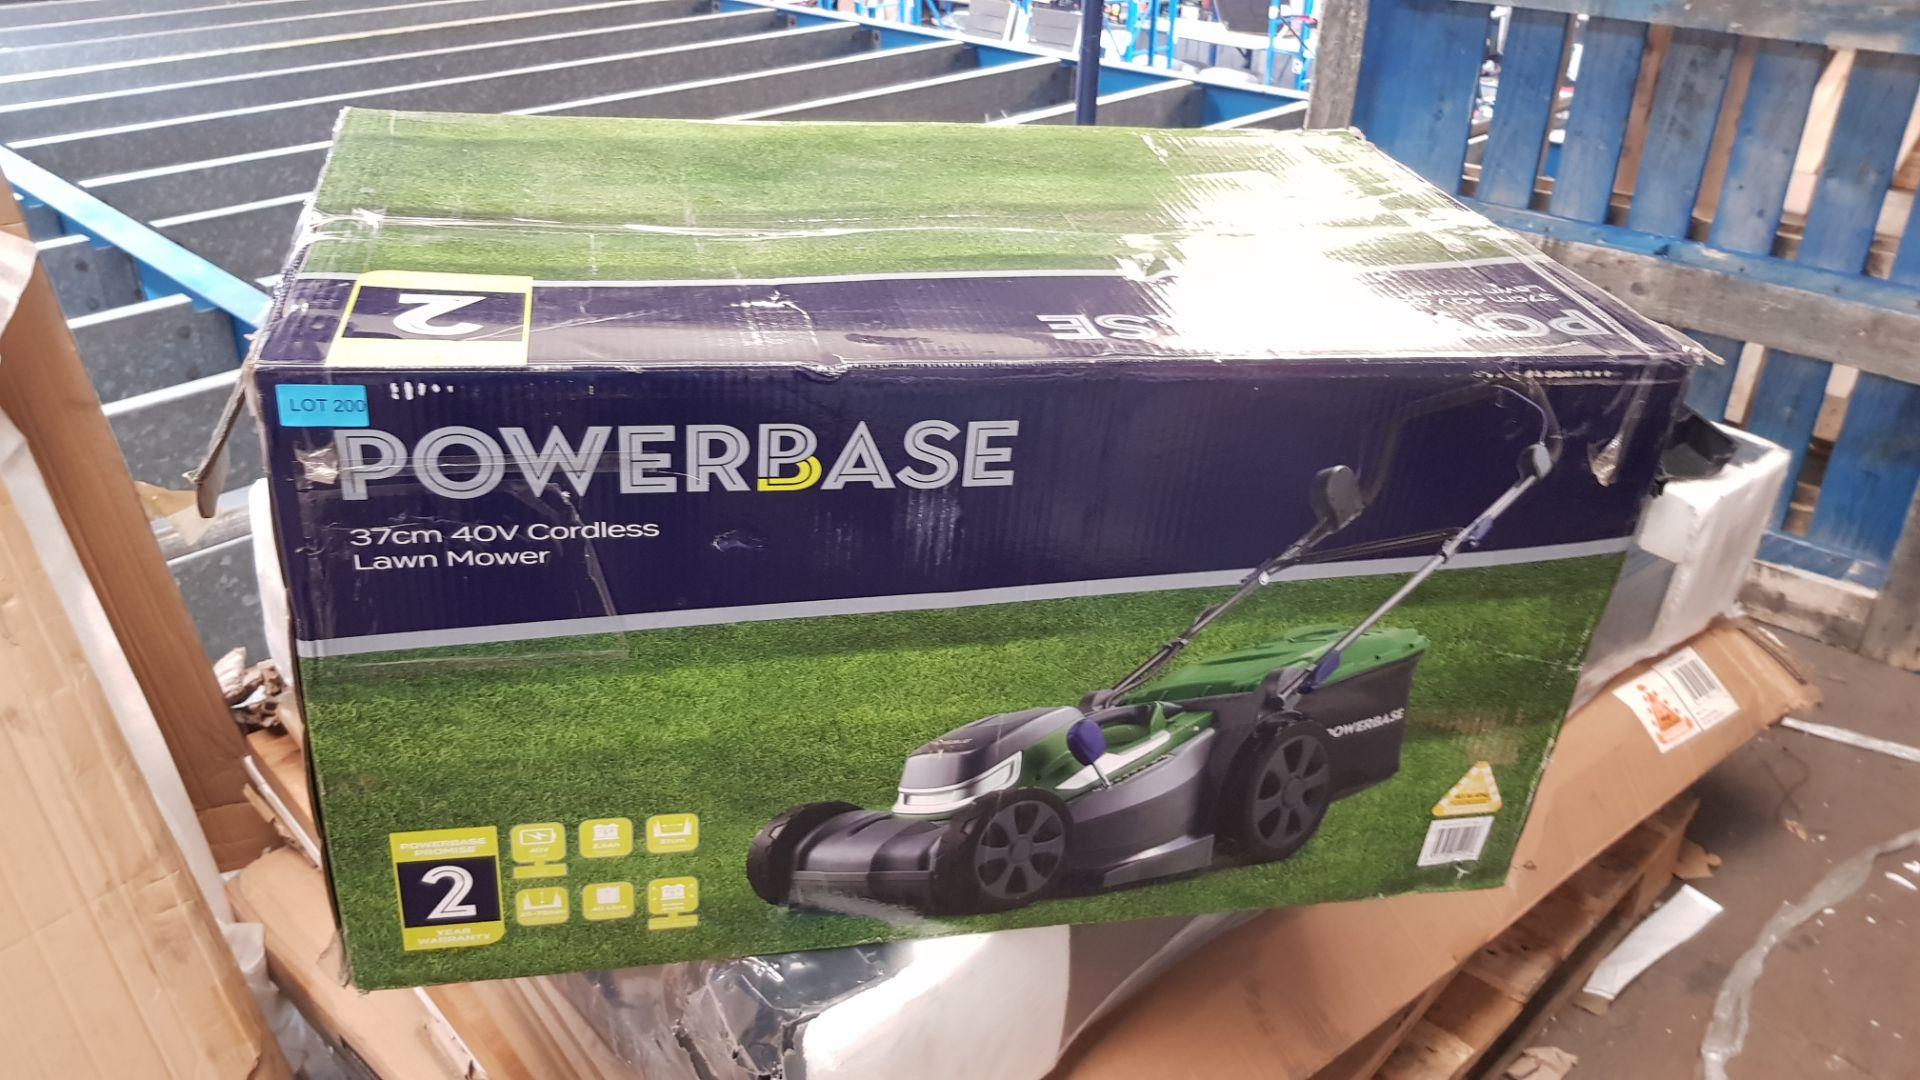 (P7) 1x Powerbase 37cm 40V Cordless Lawn Mower RRP £229. New, Sealed Unit. - Image 3 of 4